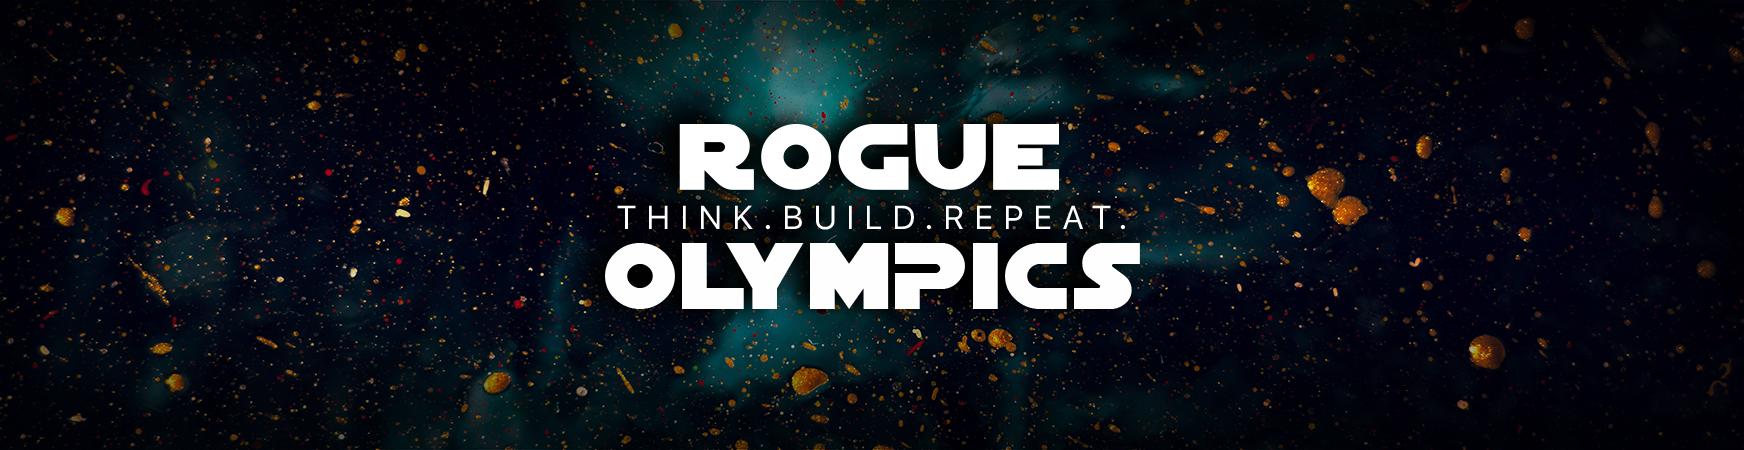 RogueOlympics2021.jpg